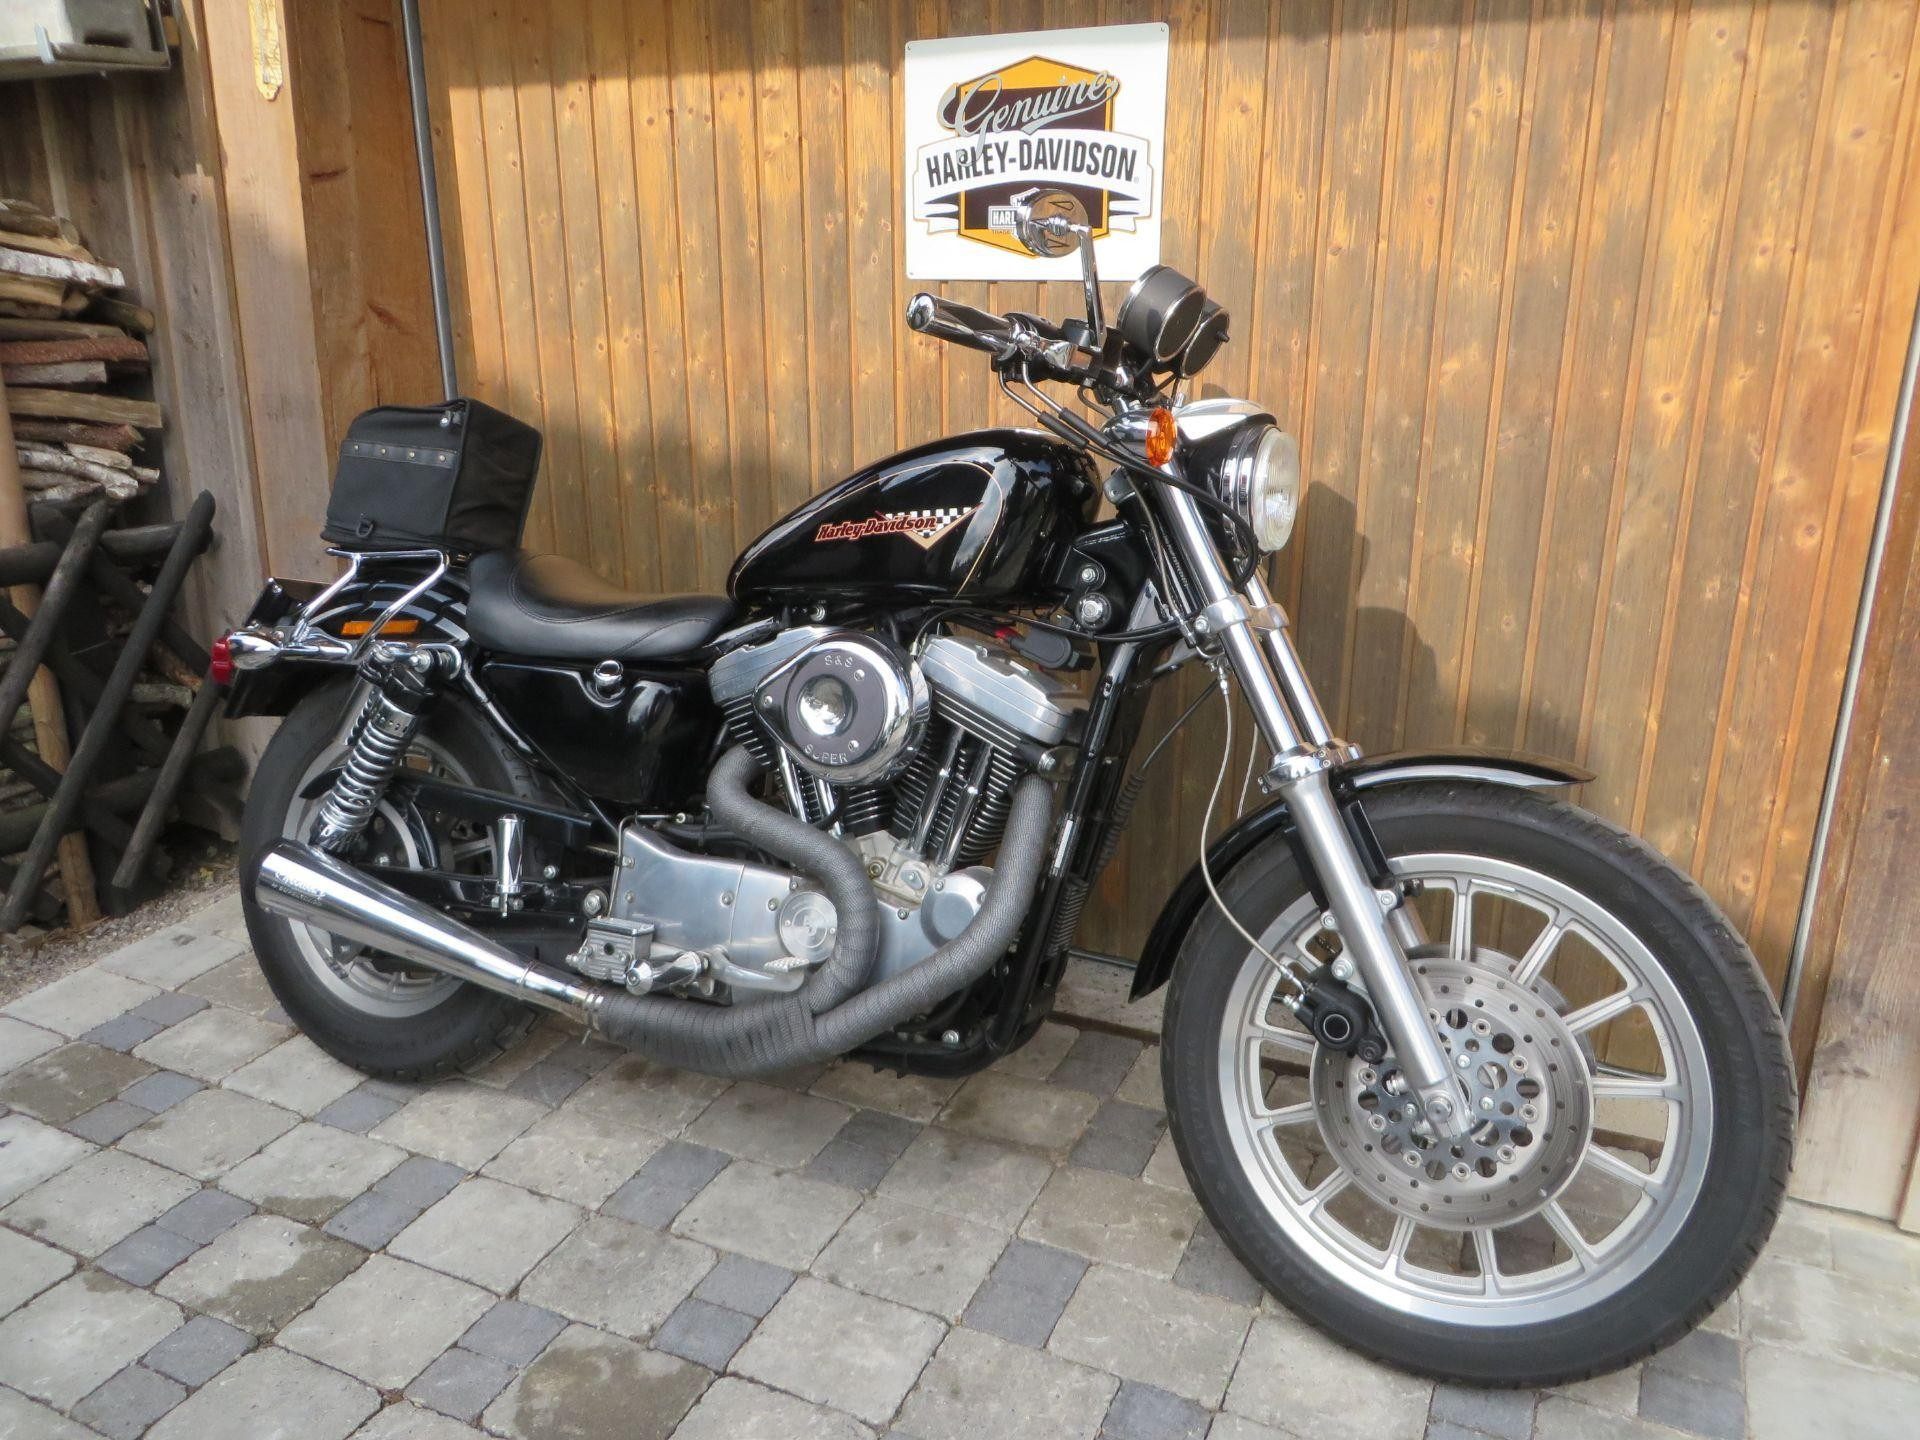 motorrad occasion kaufen harley davidson xl 1200 s sportster kressibucher motorcycle berg. Black Bedroom Furniture Sets. Home Design Ideas